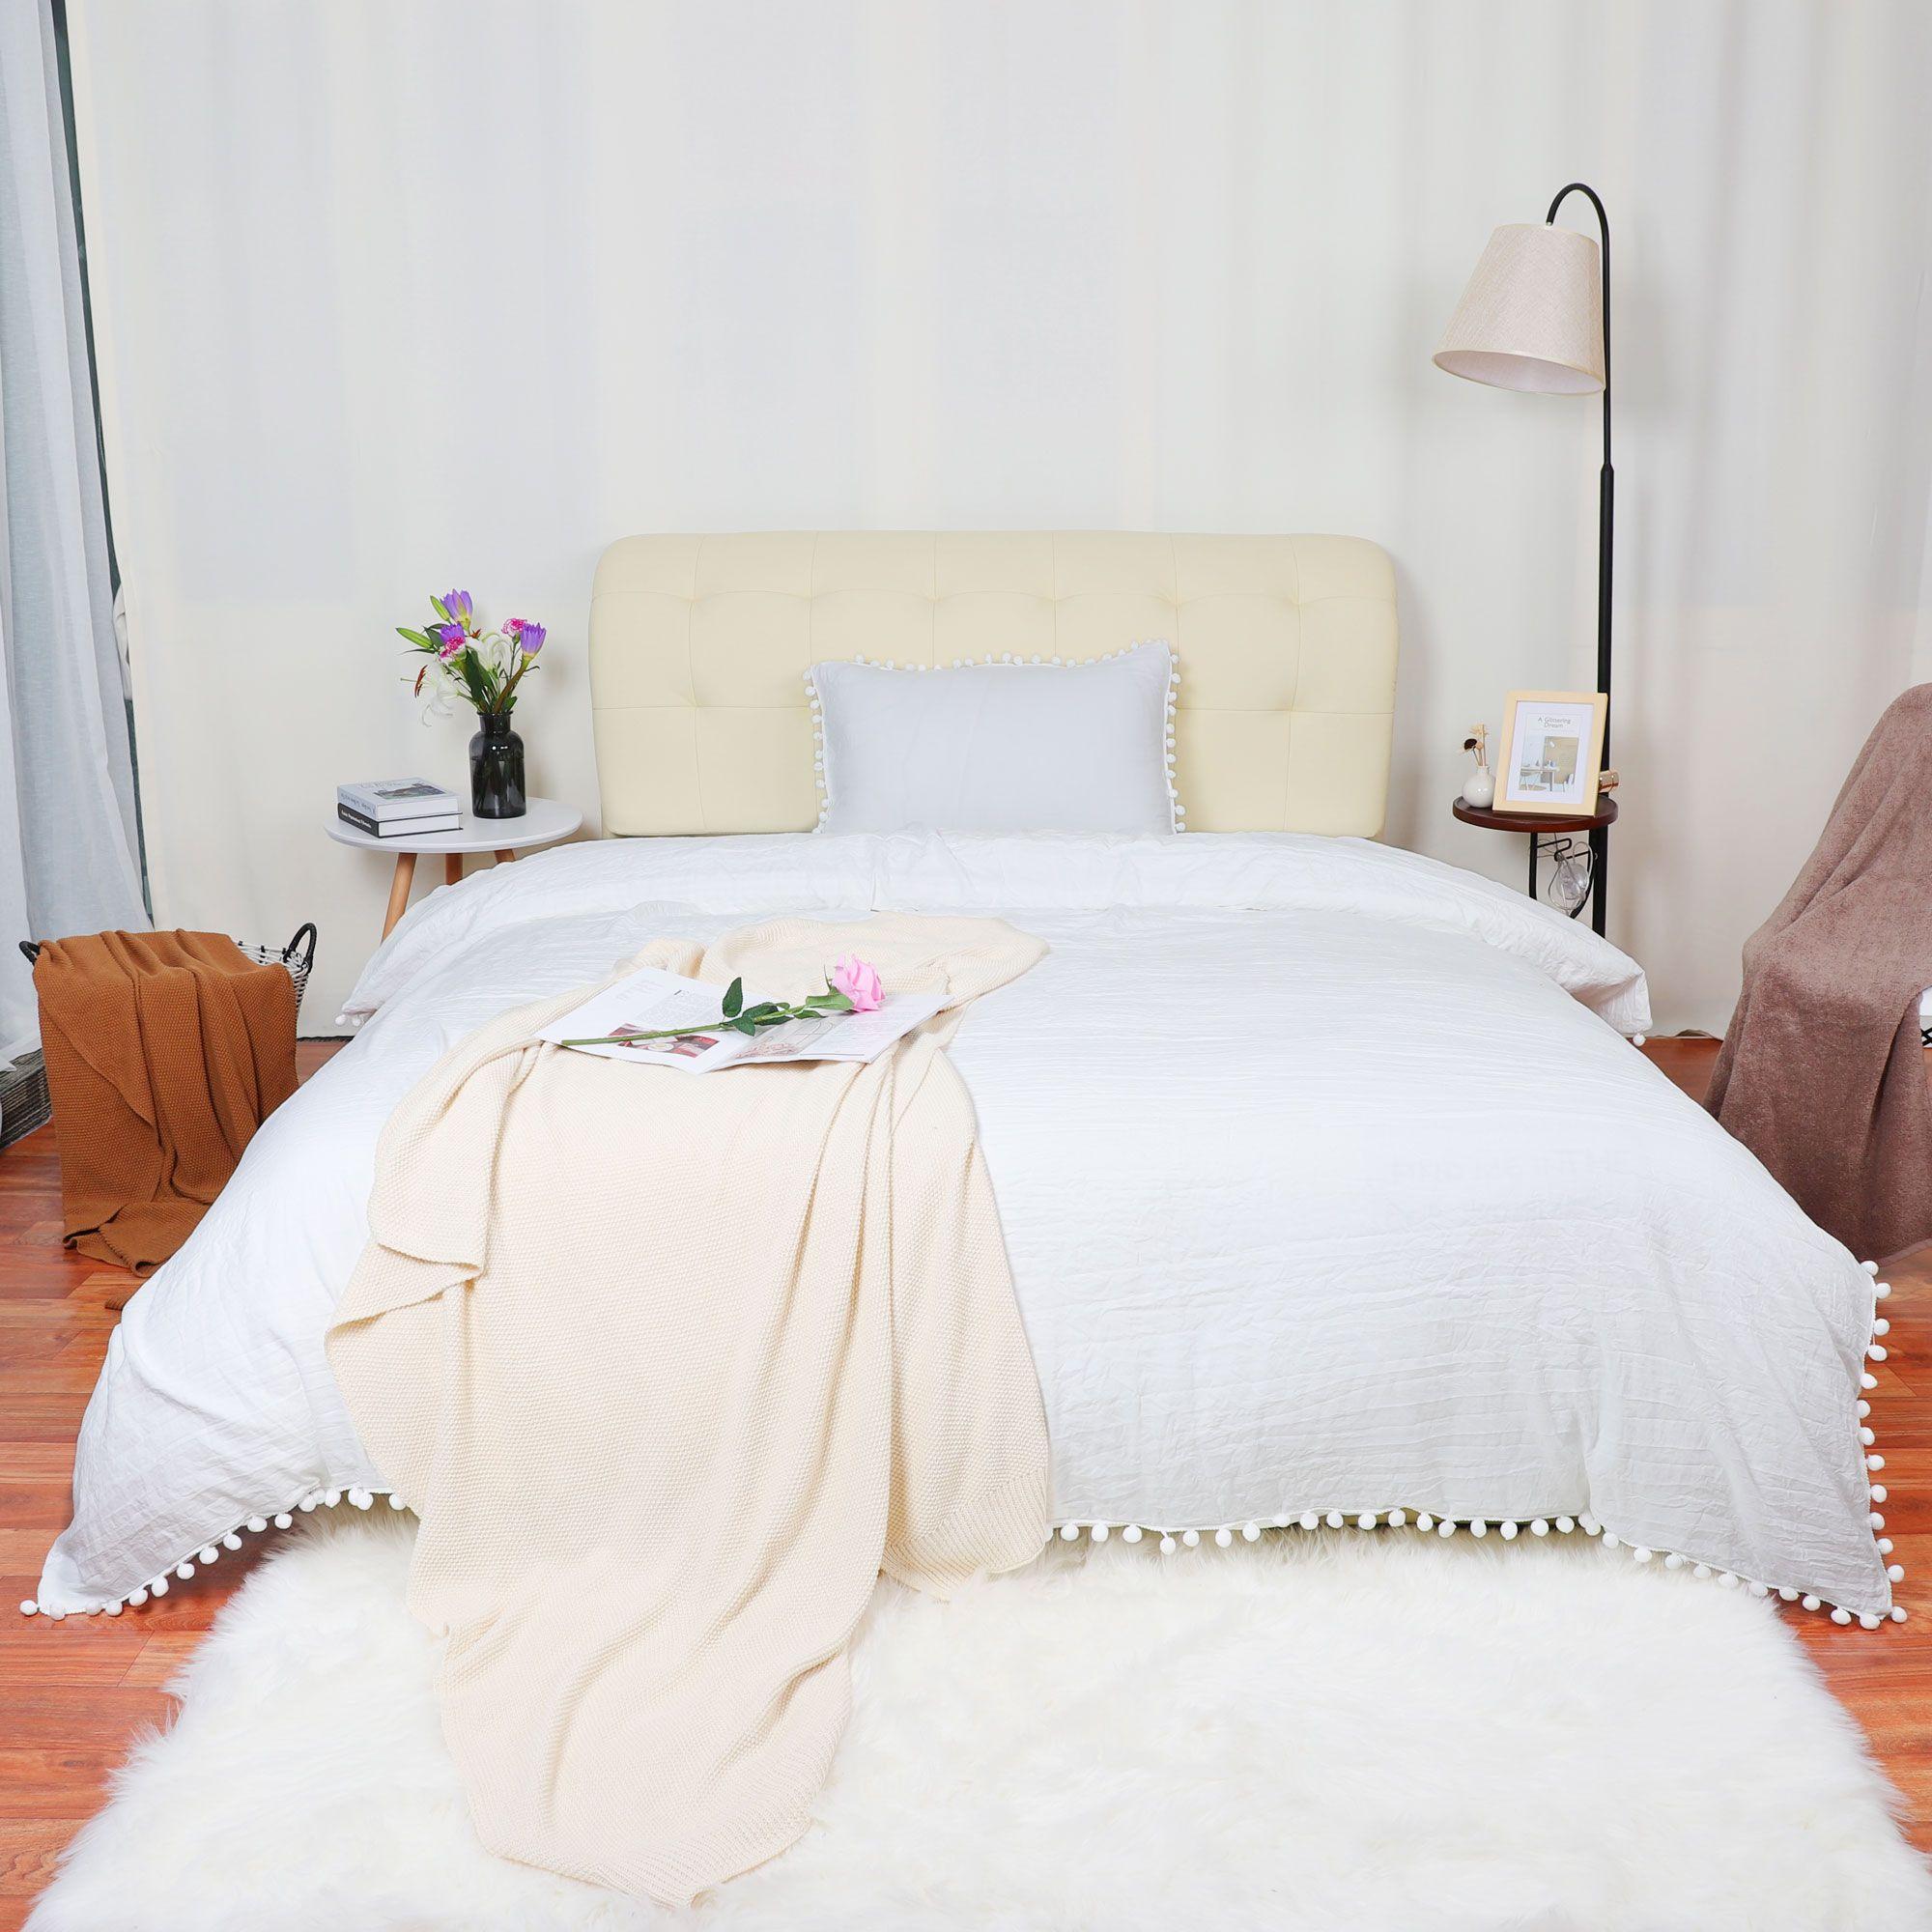 Home in 2020 Bed duvet covers, Duvet bedding, Cotton bedding